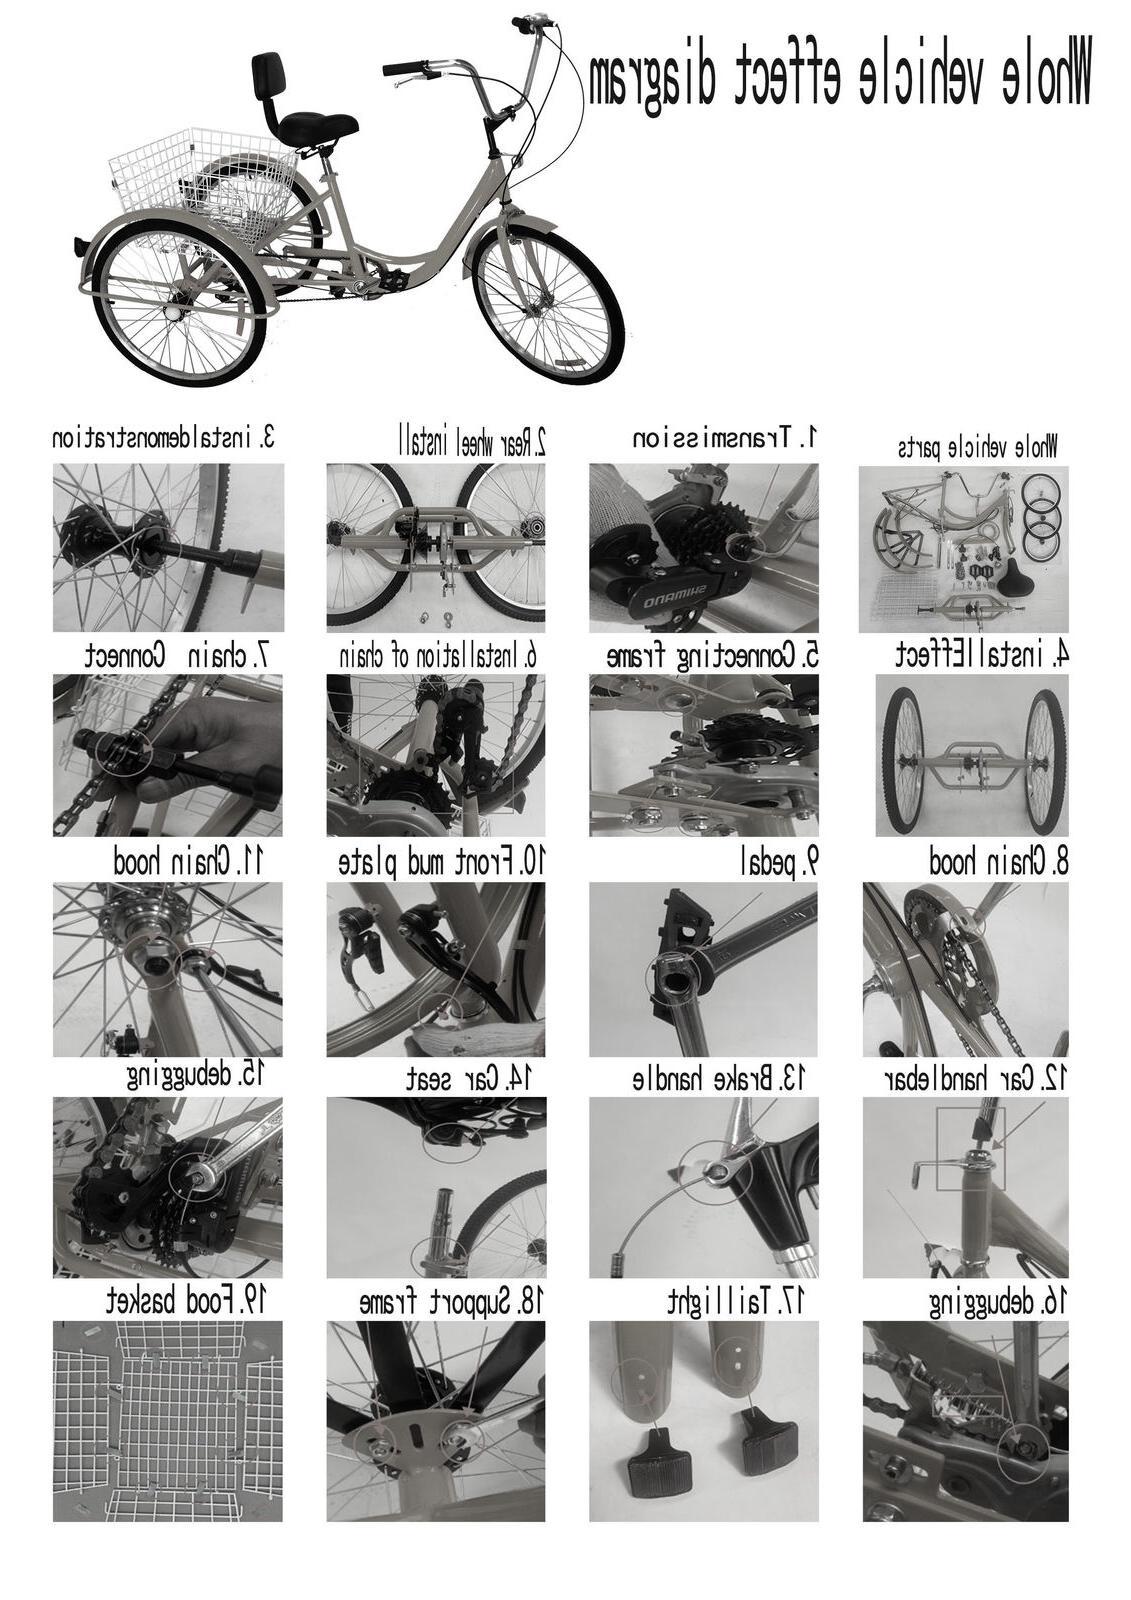 3-Wheel Bike Bicycle /